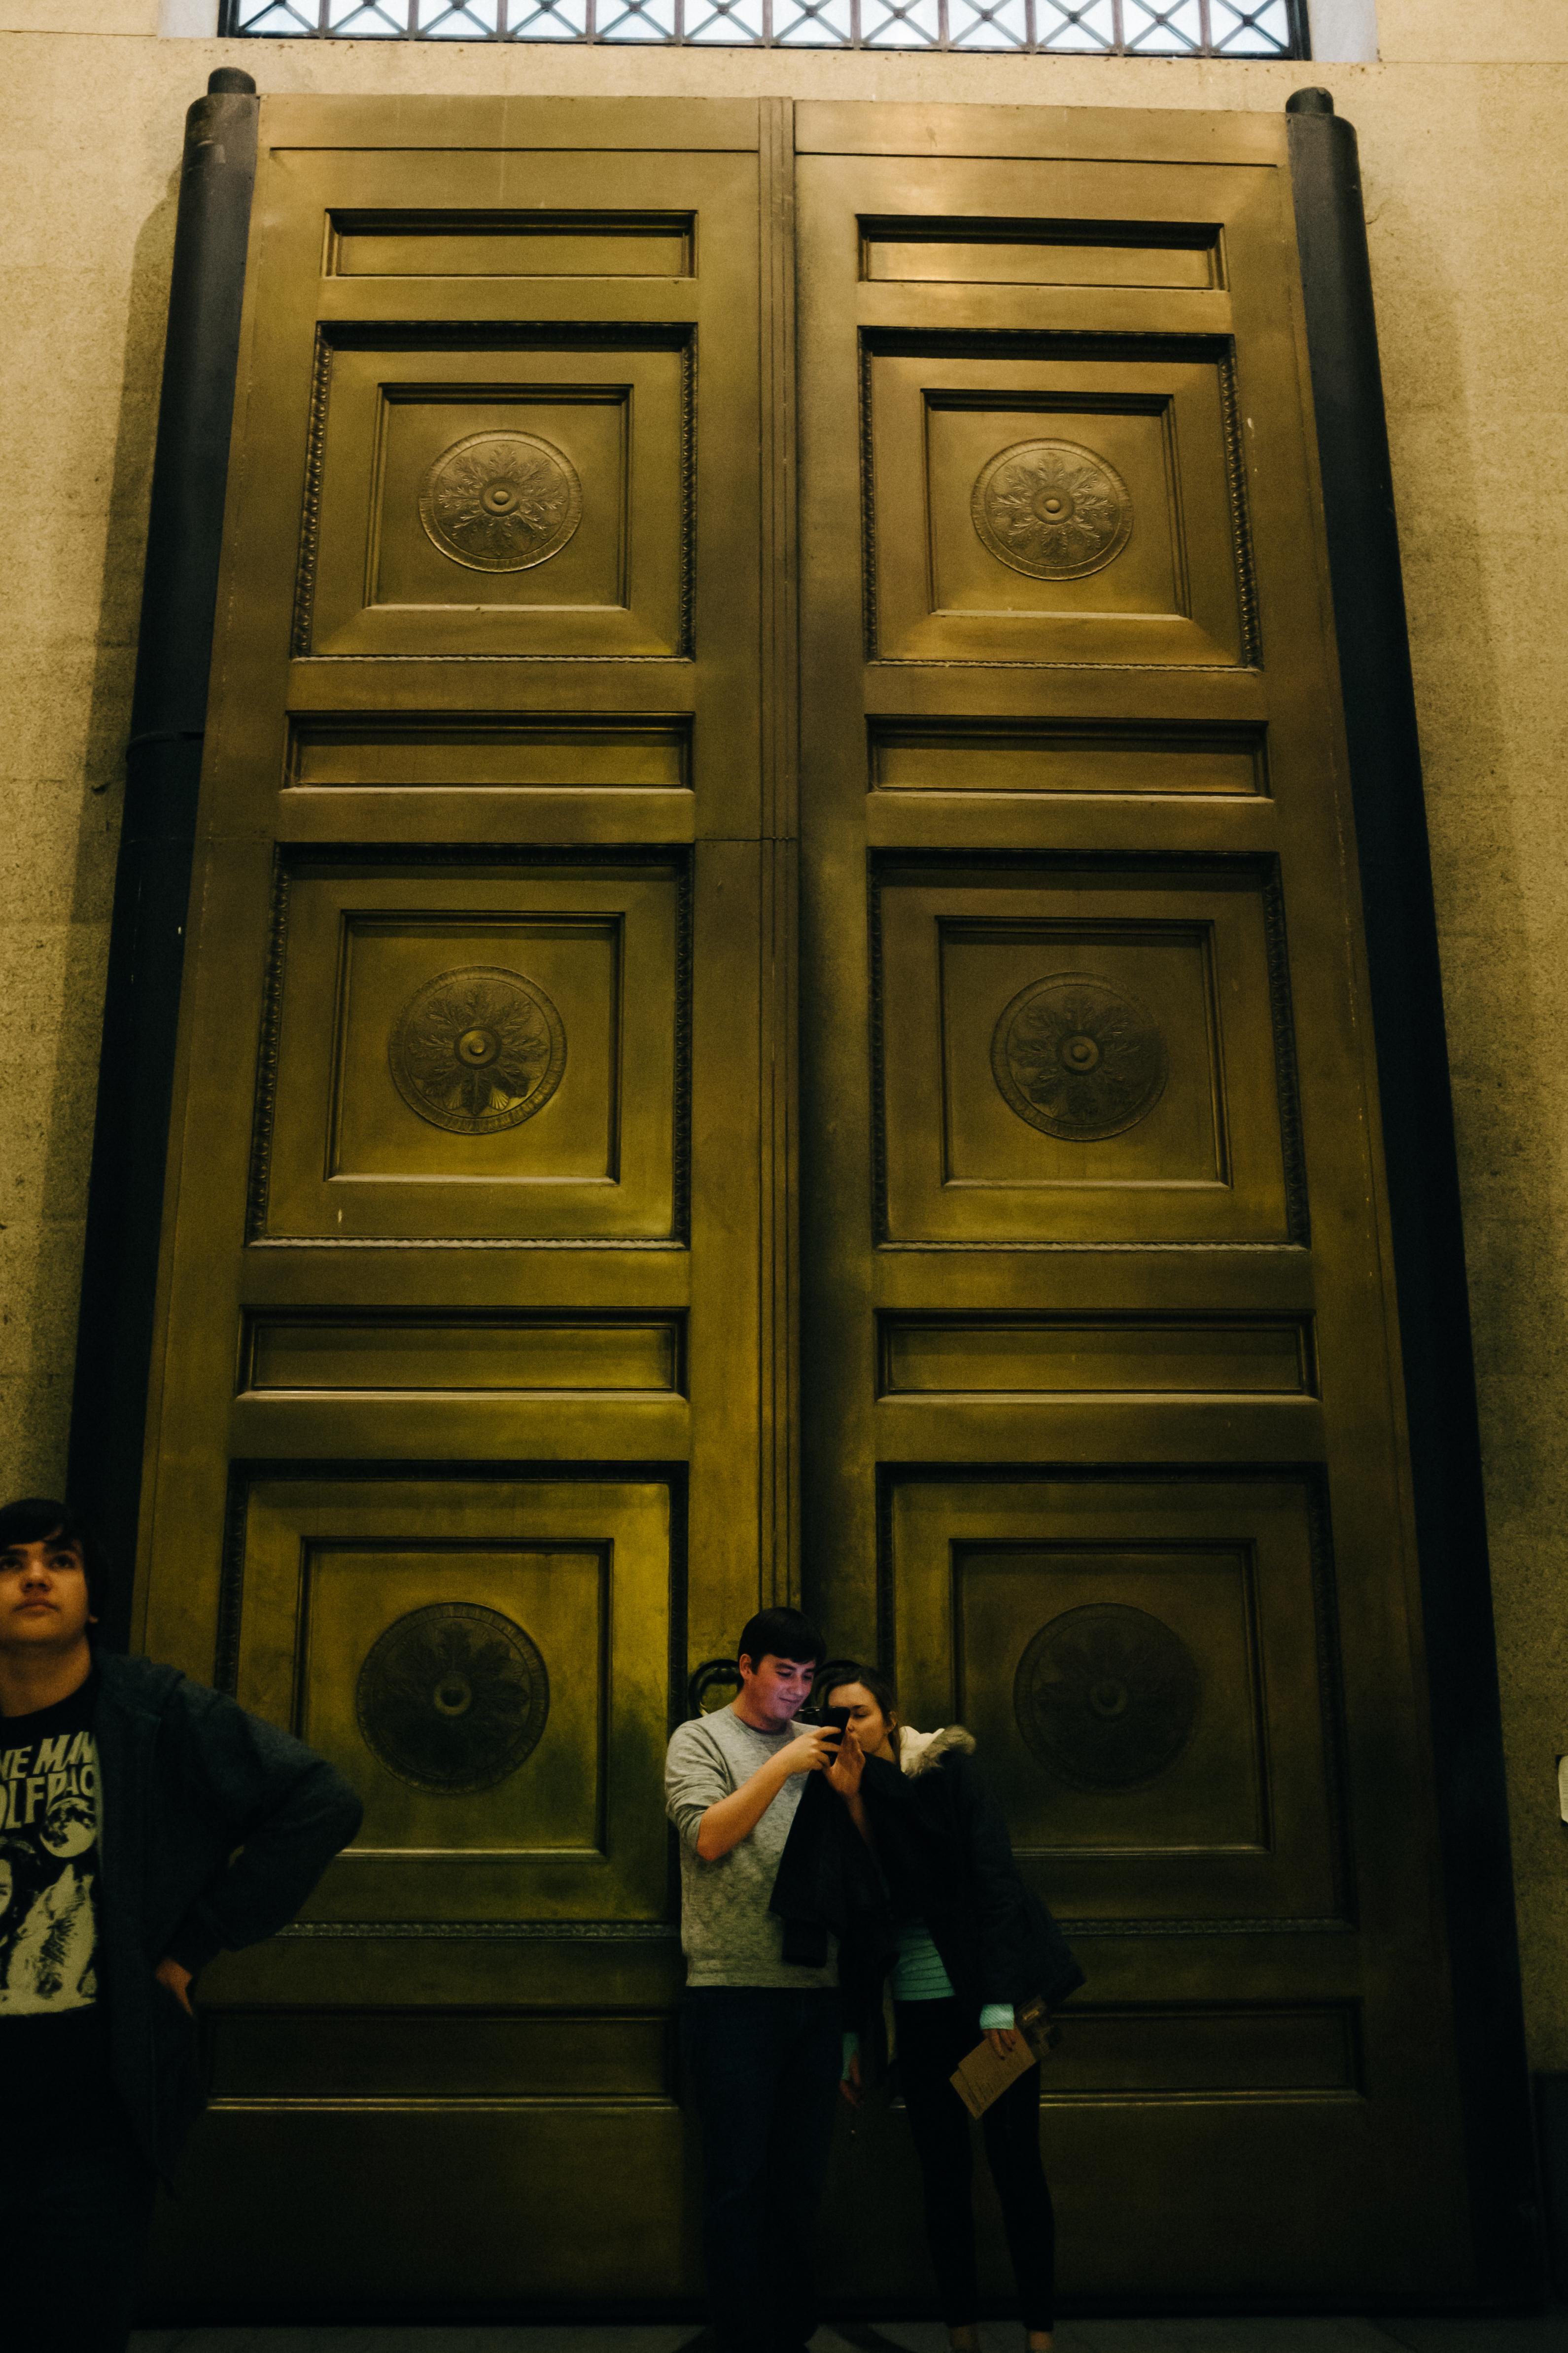 Nashville Parthenon 03